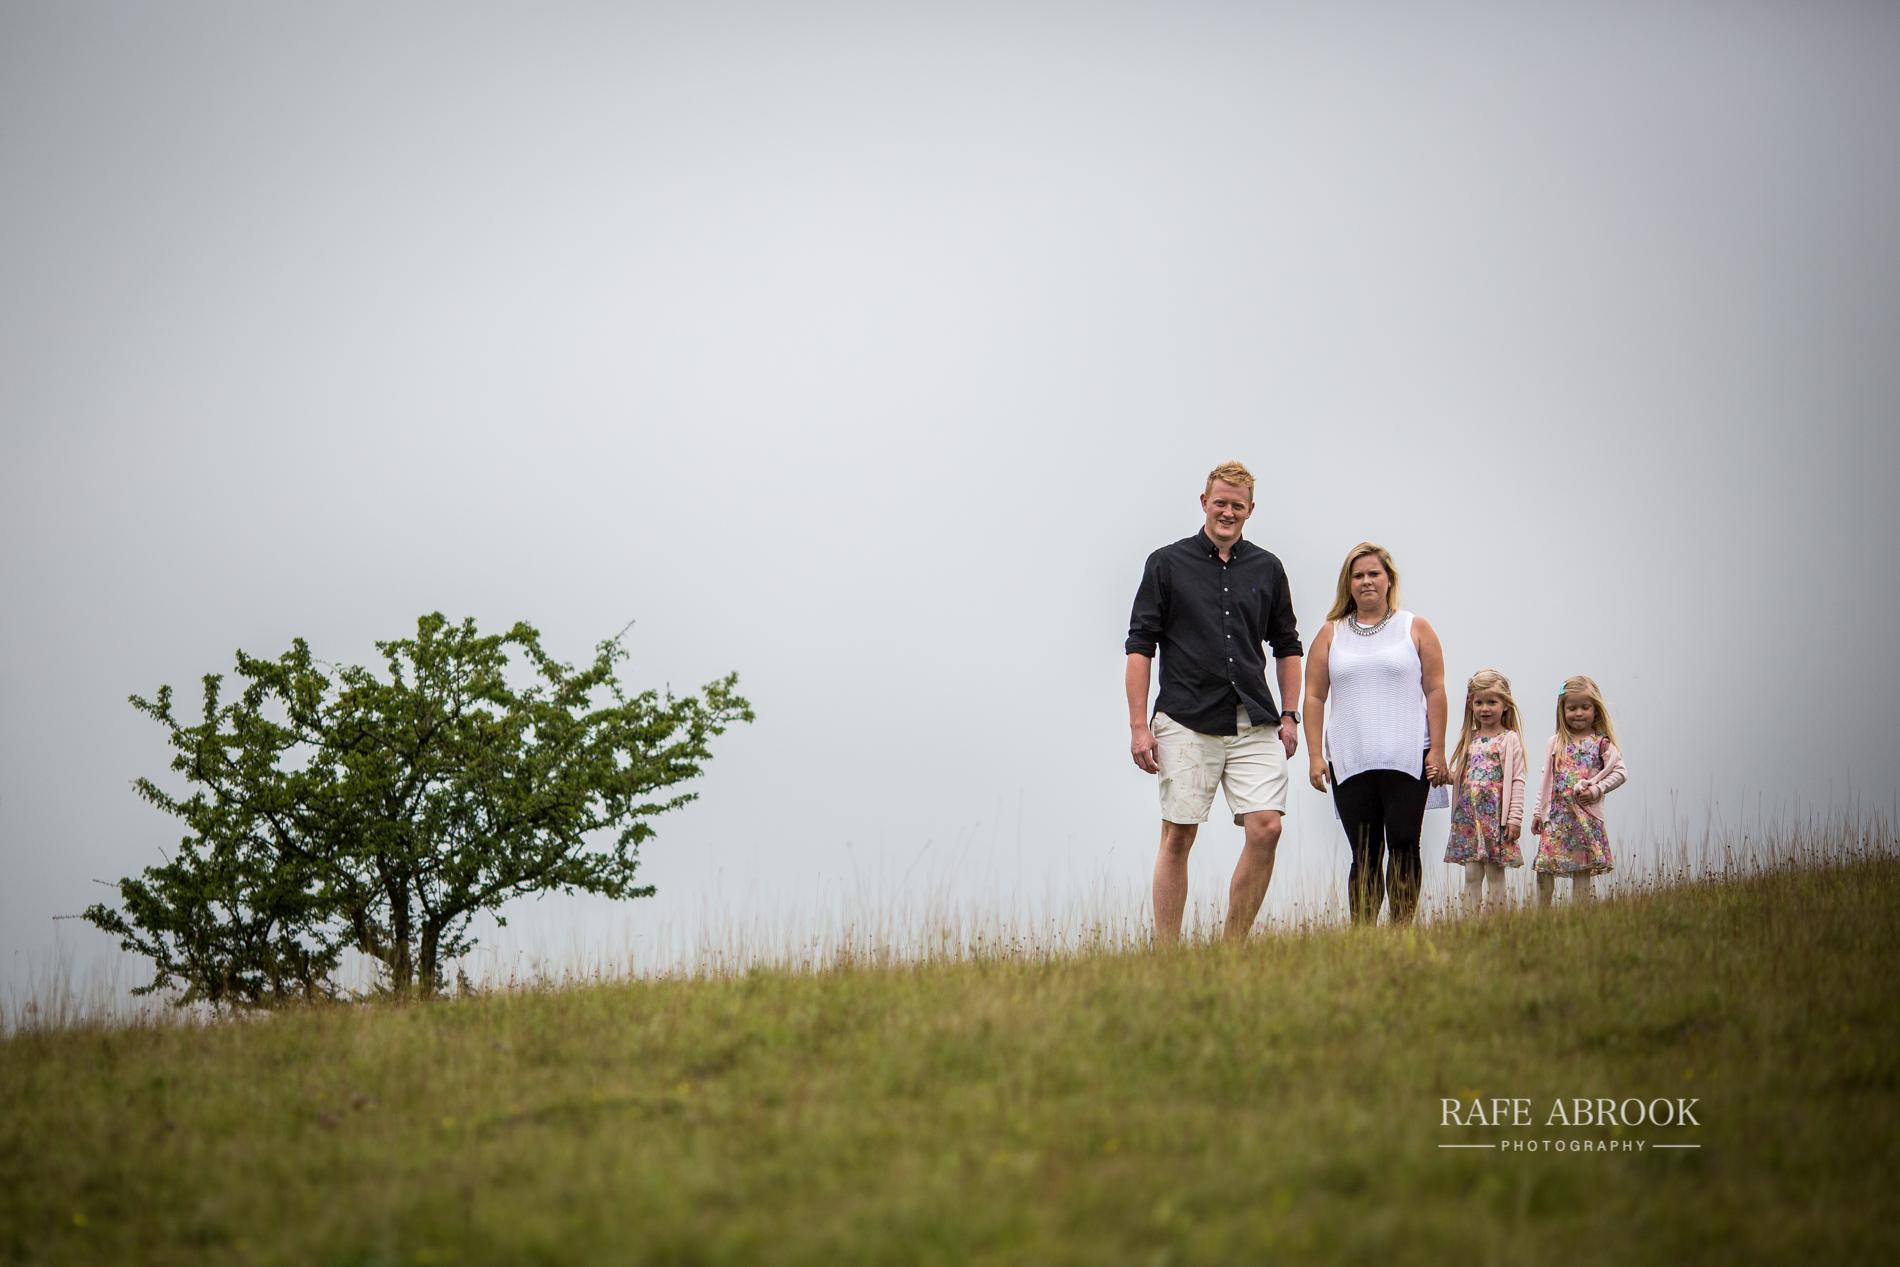 lisa & danny engagement shoot barton hills barton-le-clay bedfordshire-1023.jpg